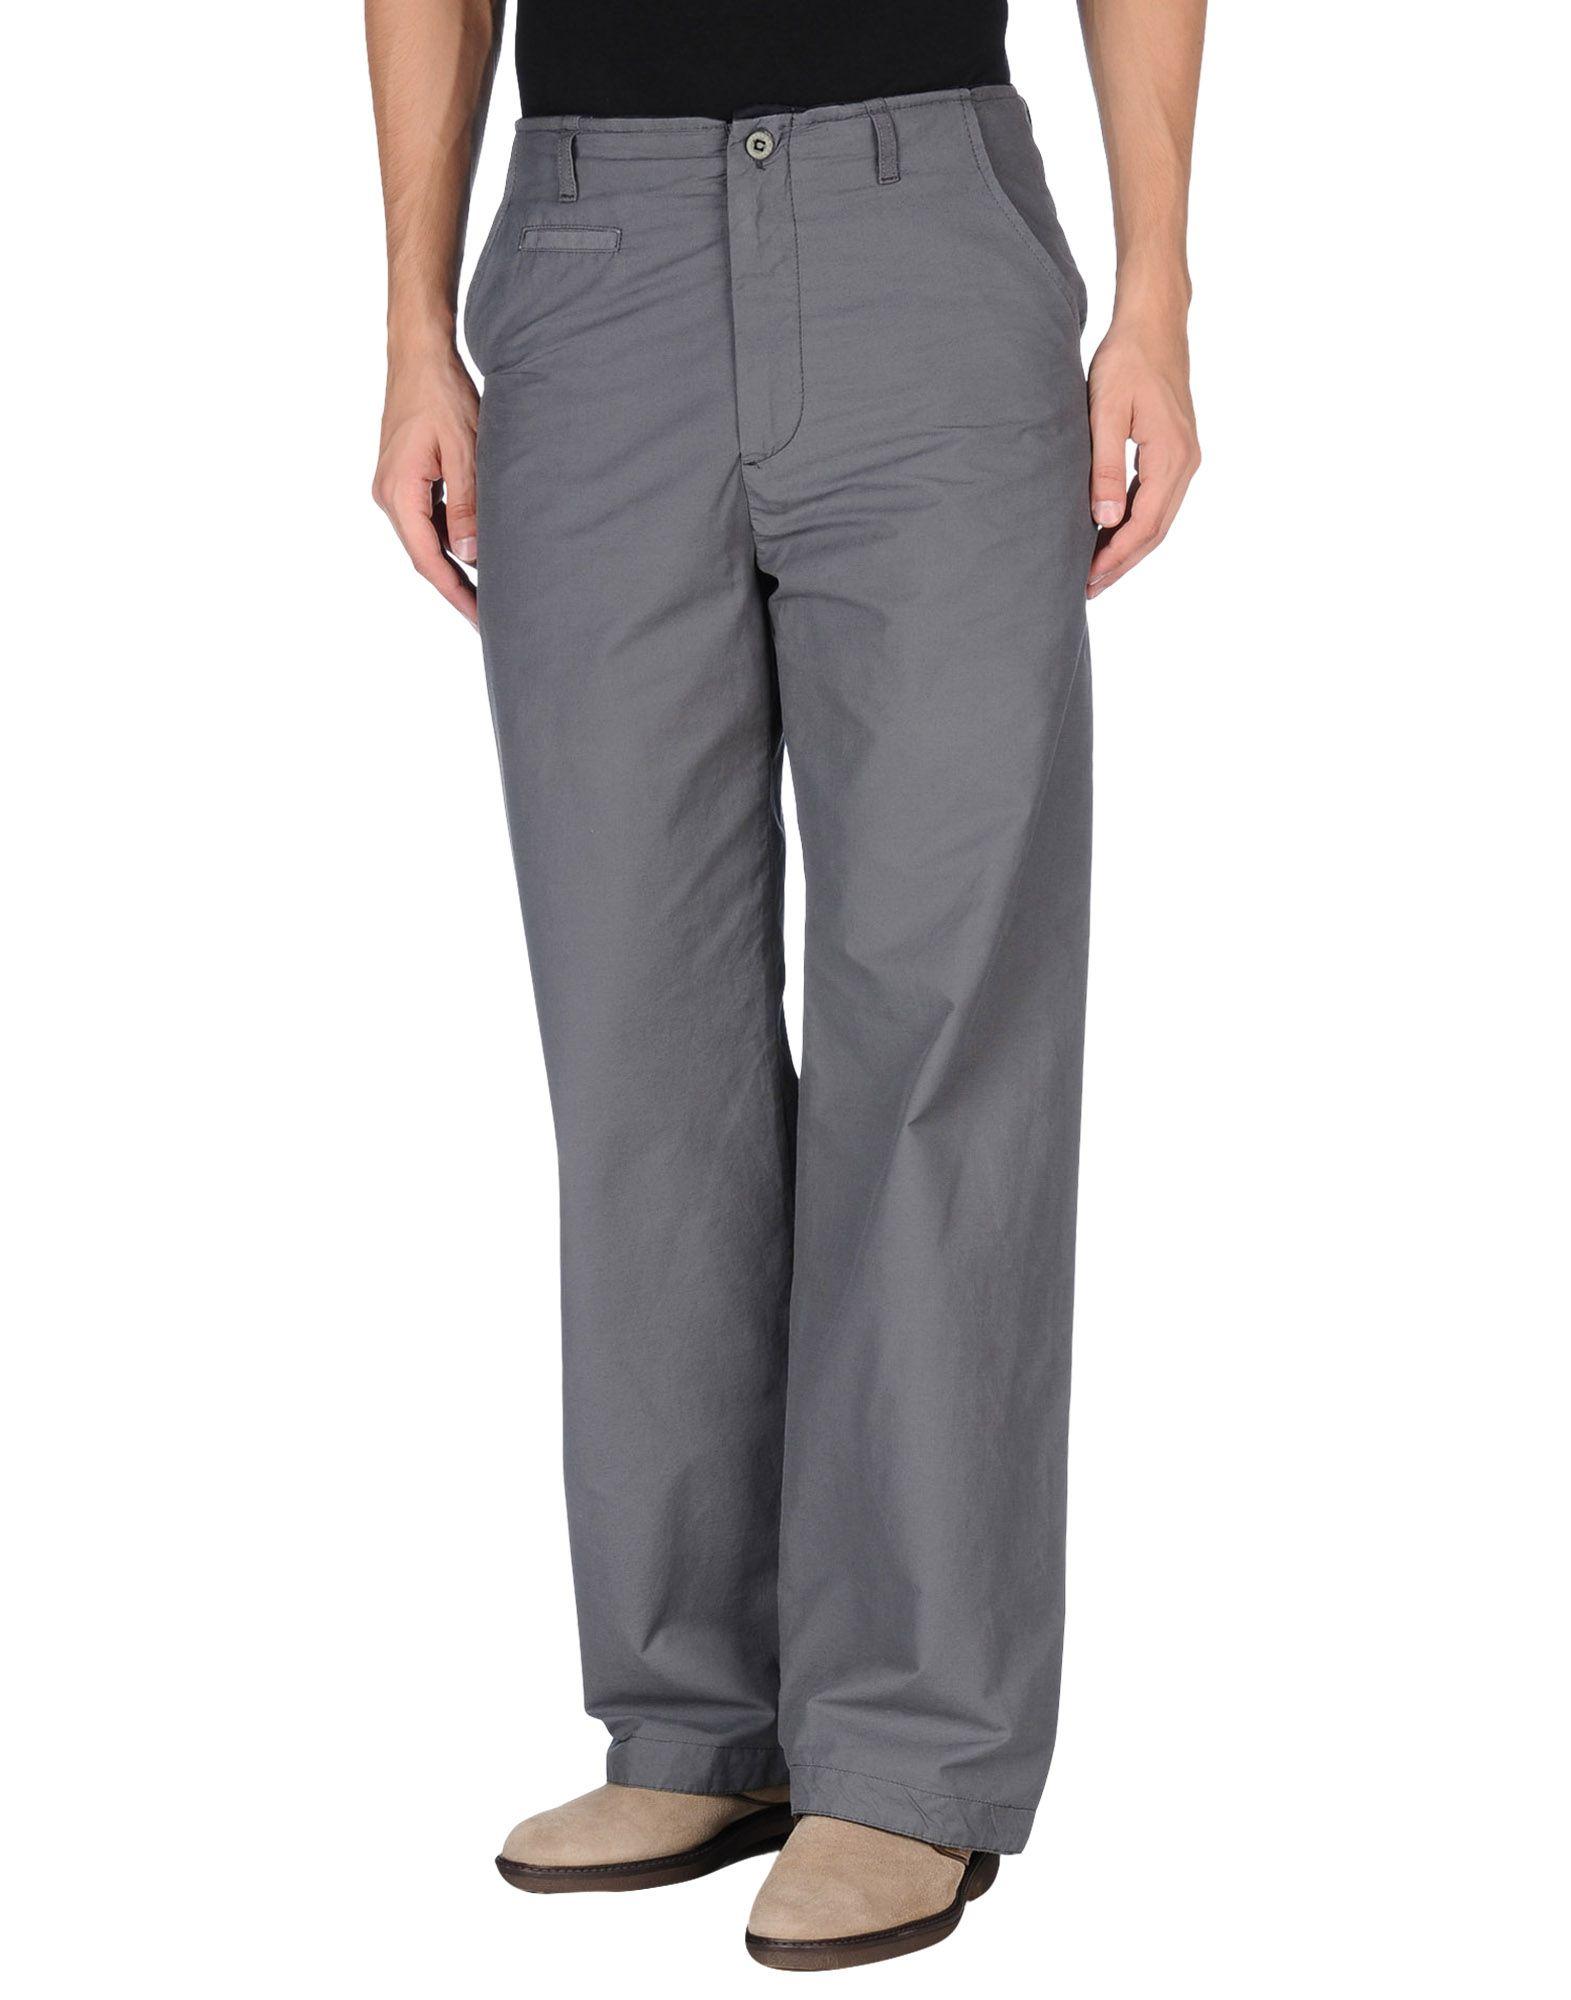 Amazing Fine Gray Plaid Print Pants  Women PantsCasual PantsChic Pants